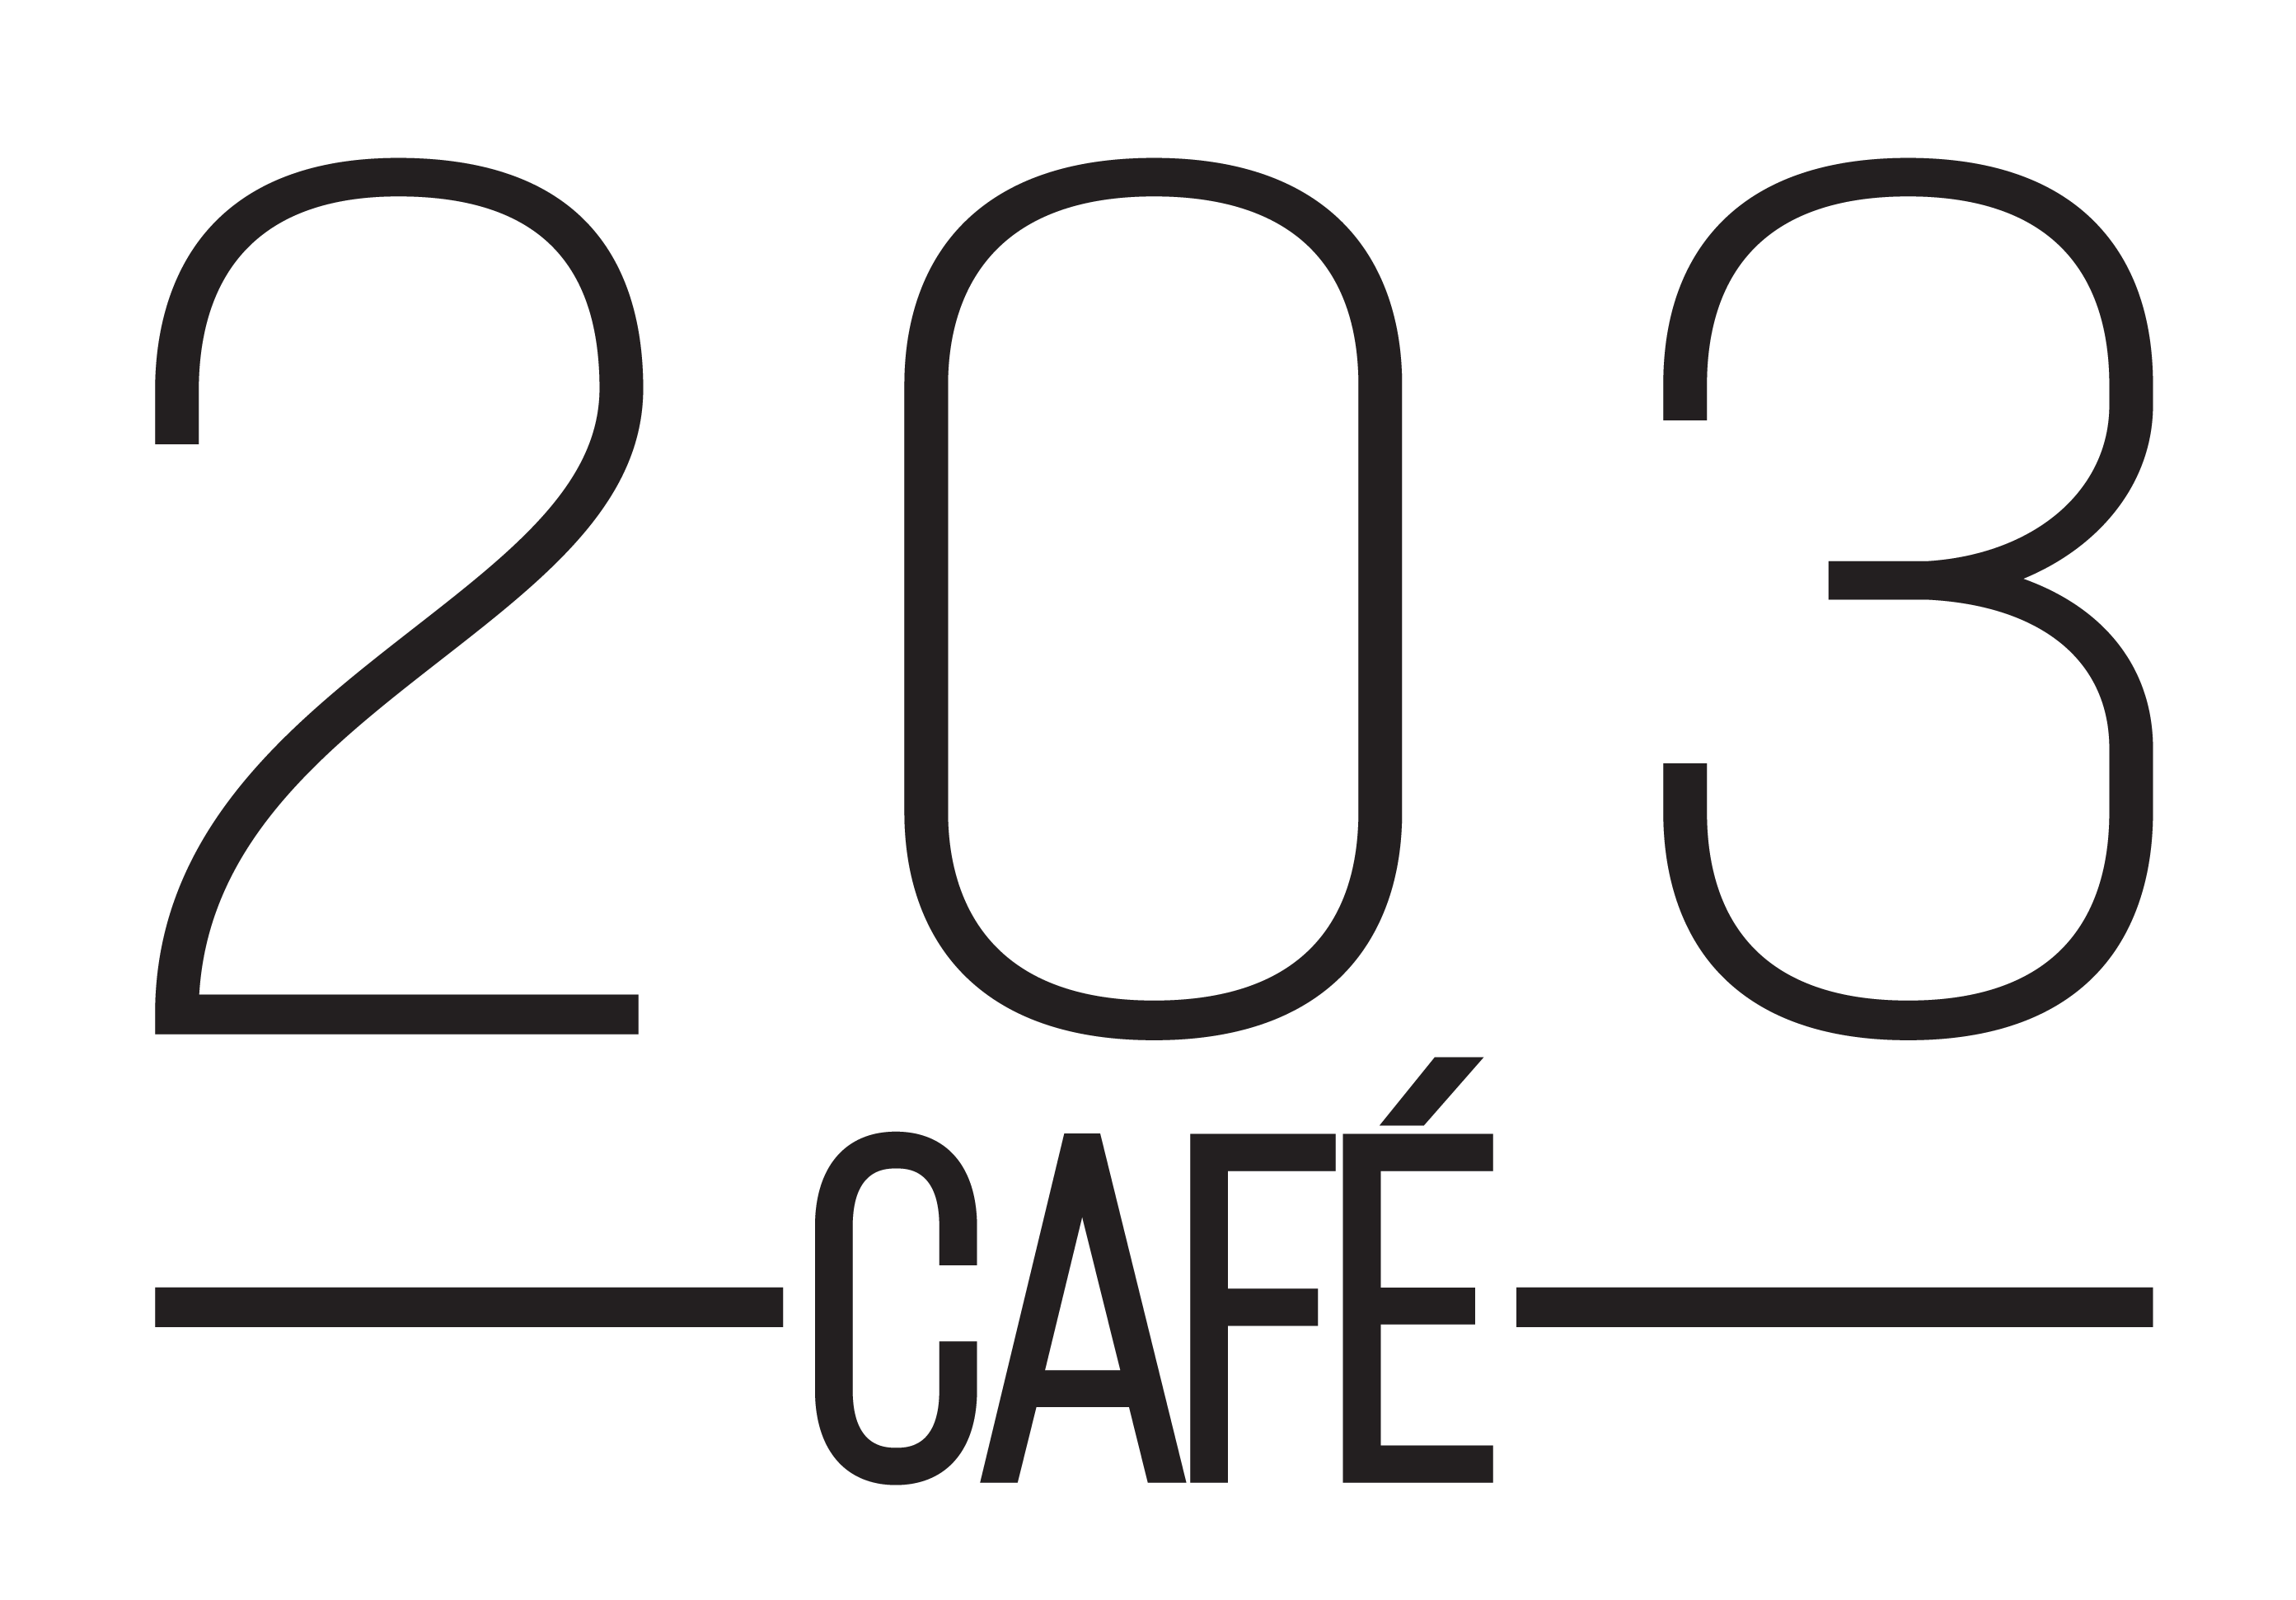 203 Cafe